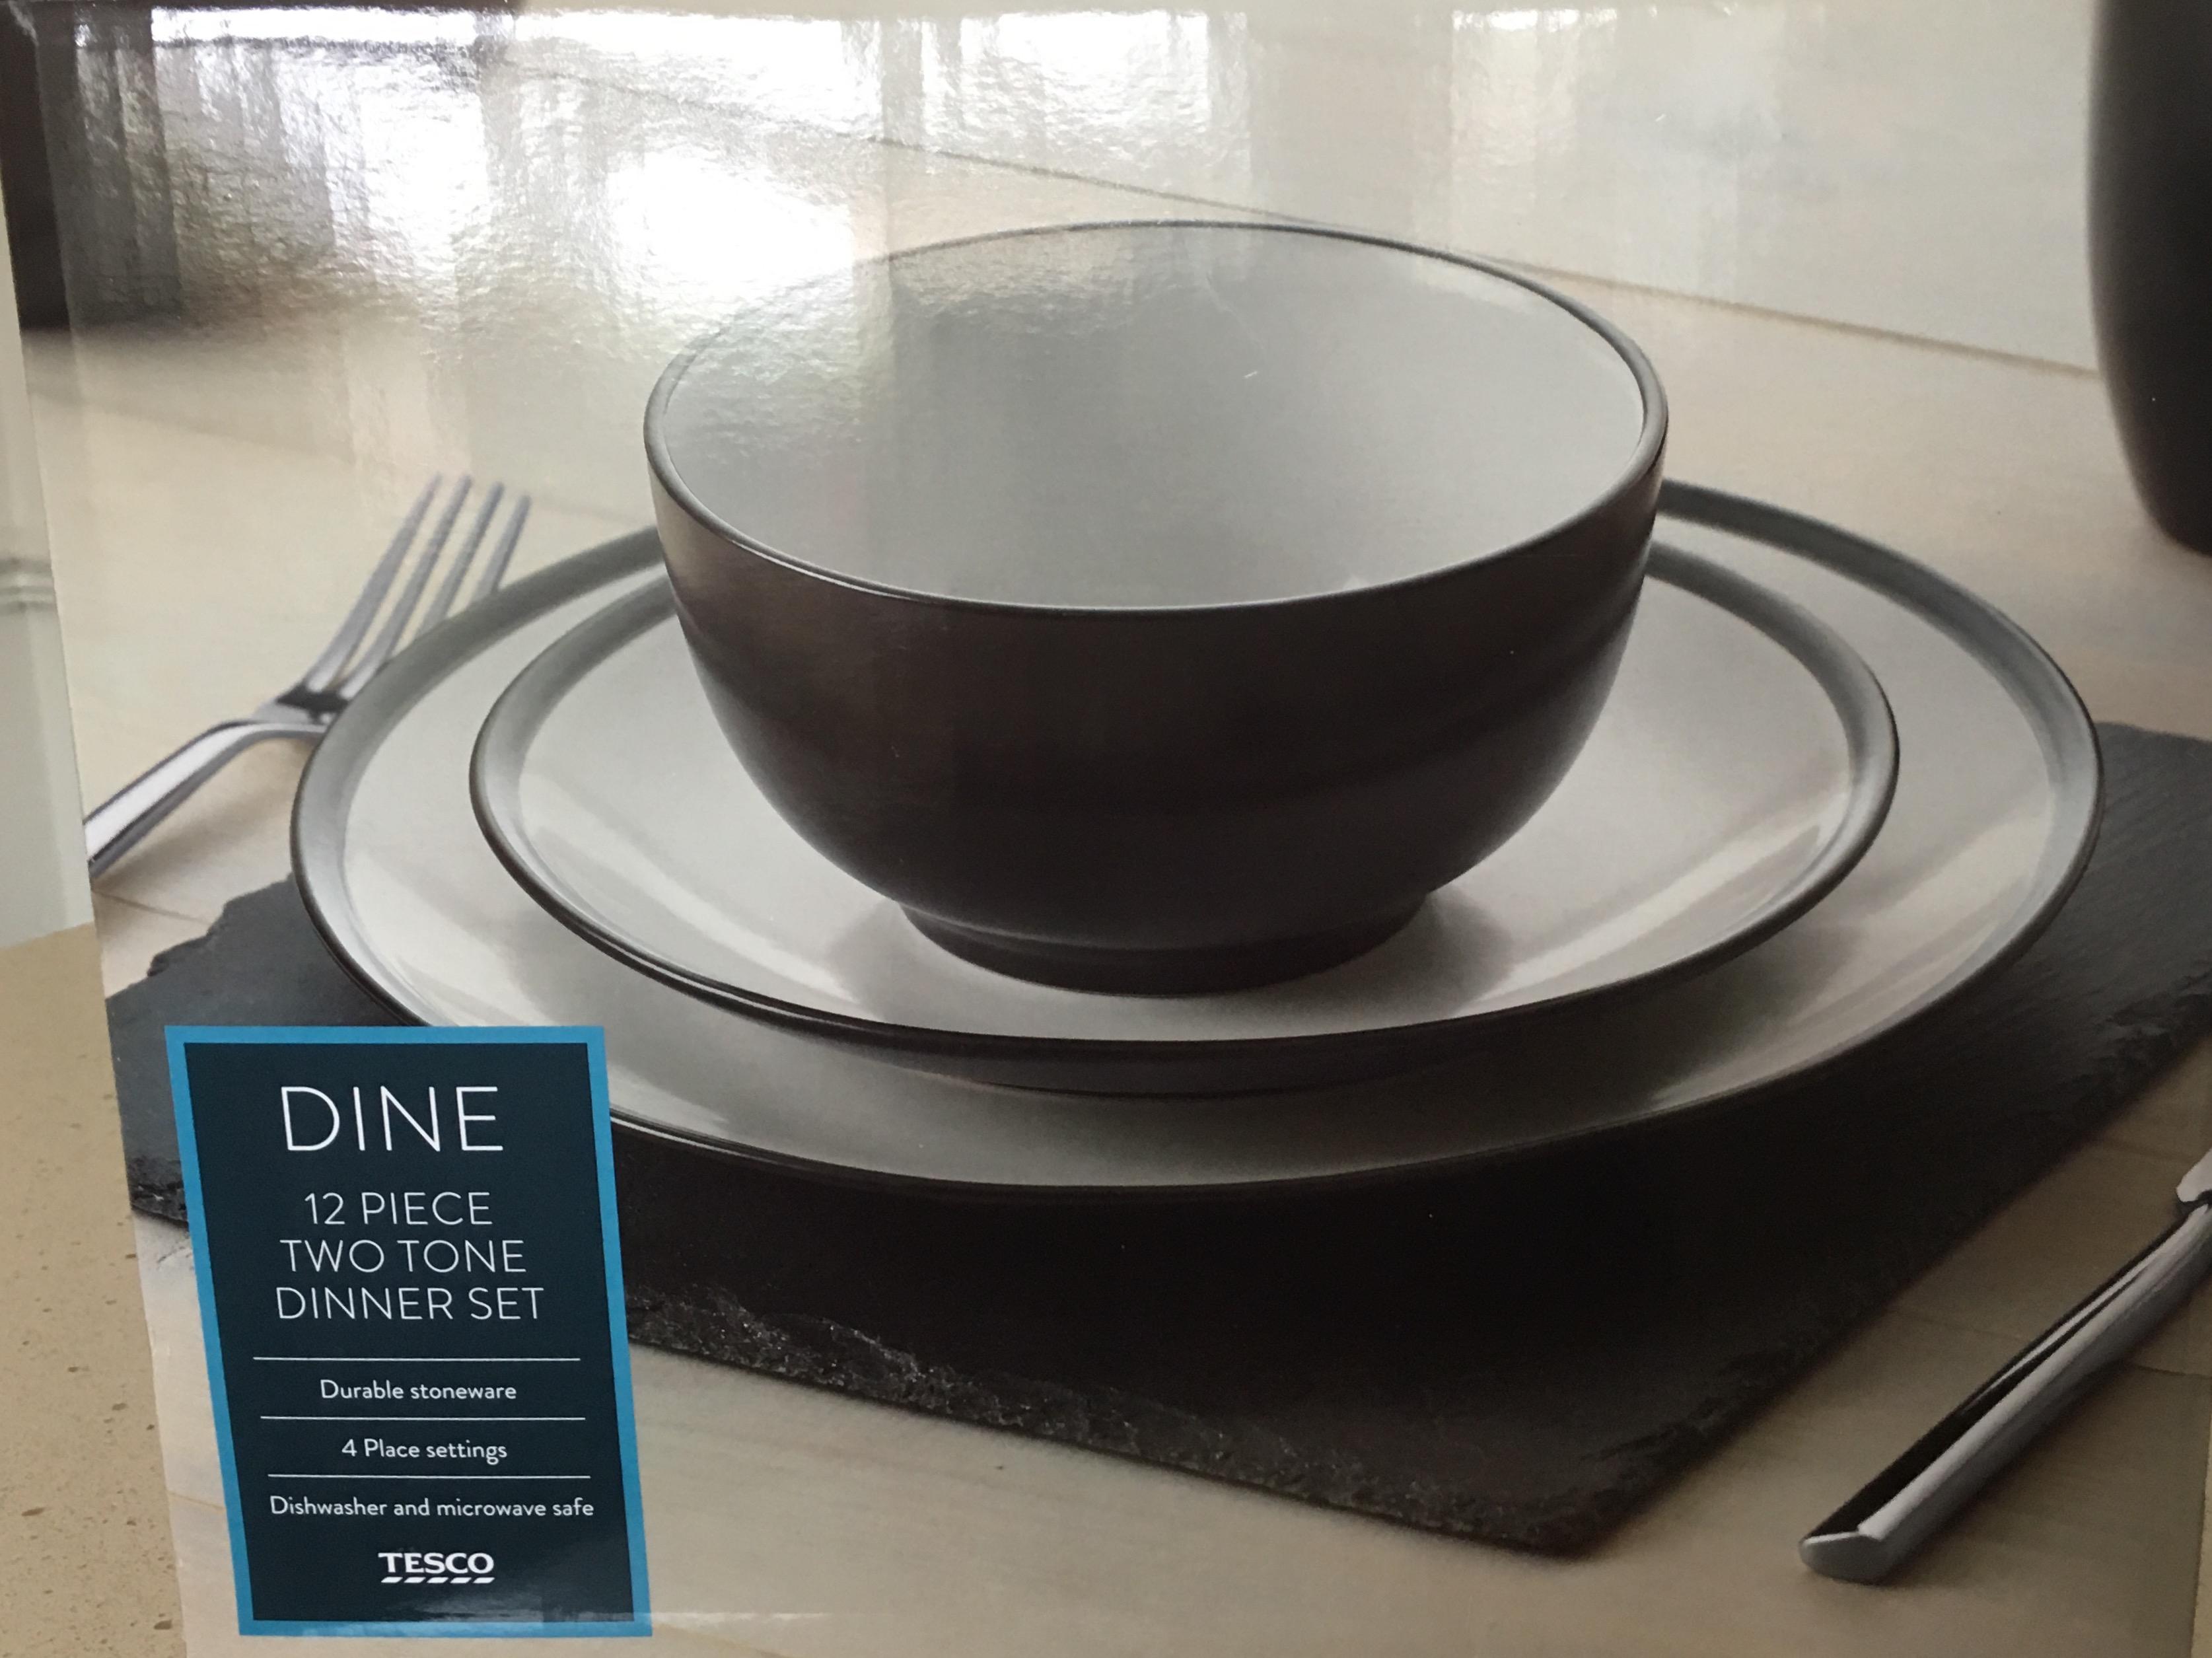 Tesco 12 piece two tone stoneware dinner set - £5 in Aldershot store